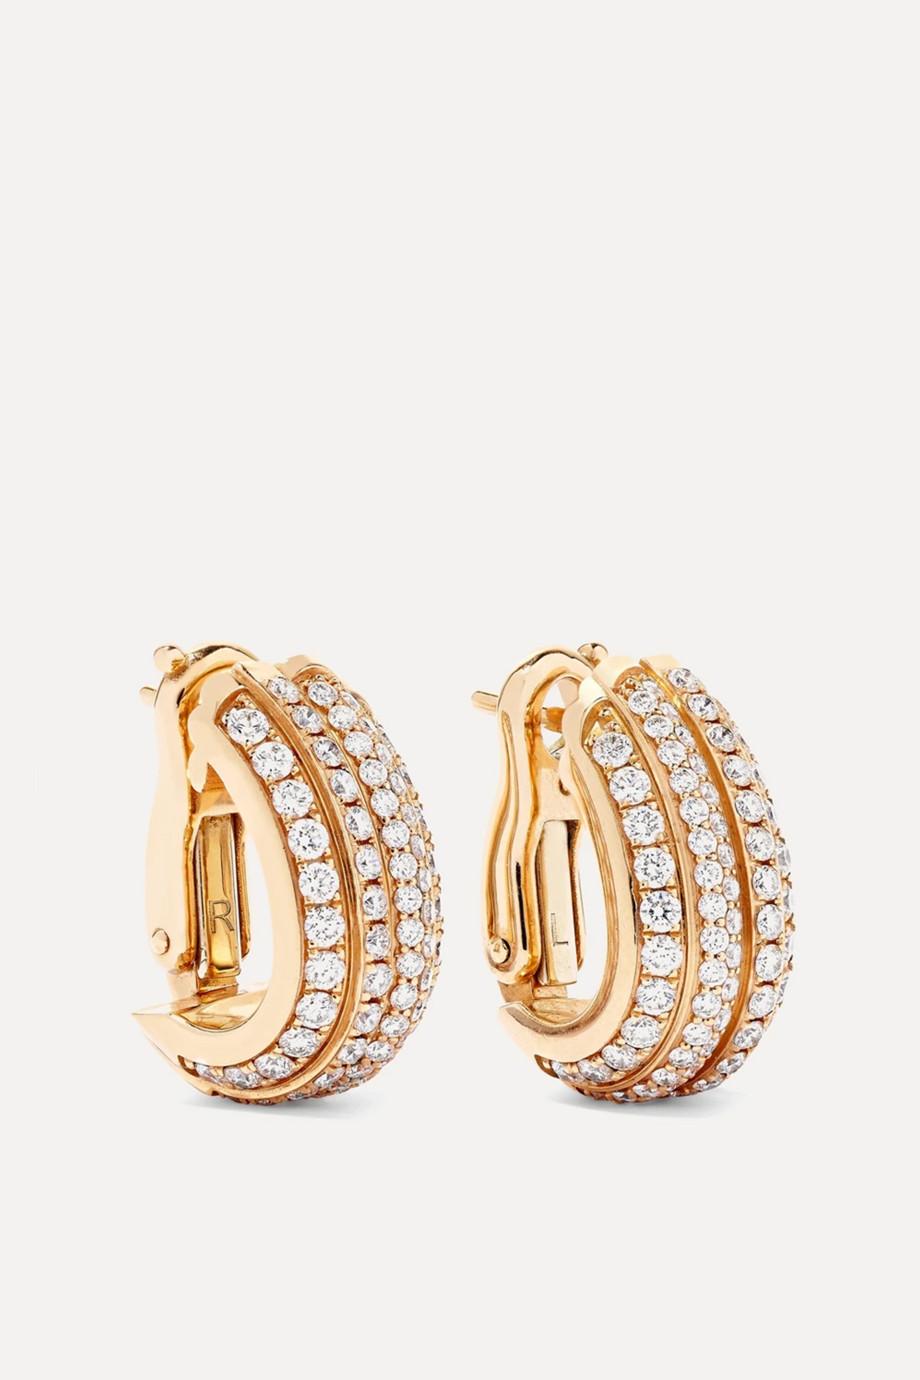 Piaget Possession 18-karat rose gold diamond hoop earrings